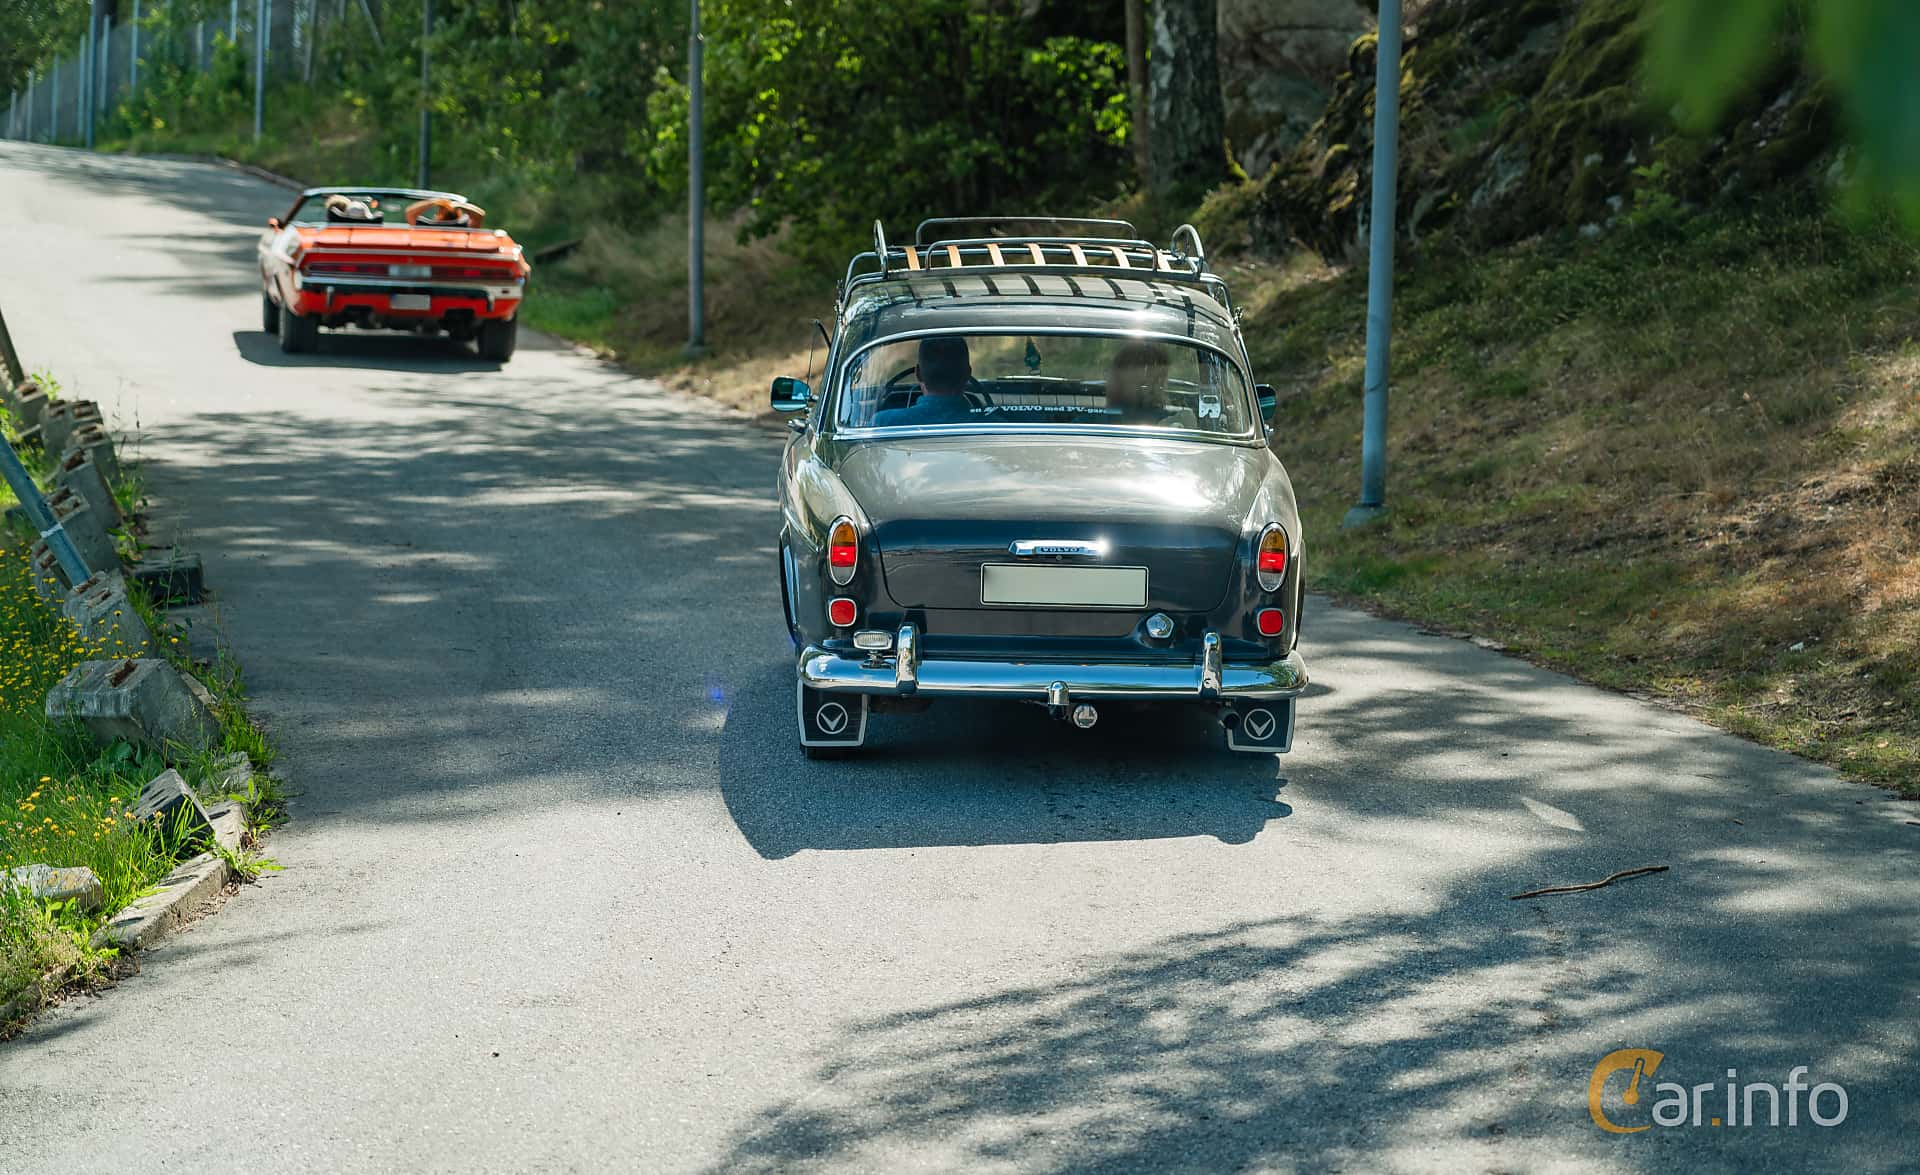 Volvo Amazon 121 P130 1.8 Manual, 75hp, 1965 at Stockholm Vintage & Sports Car meet 2019